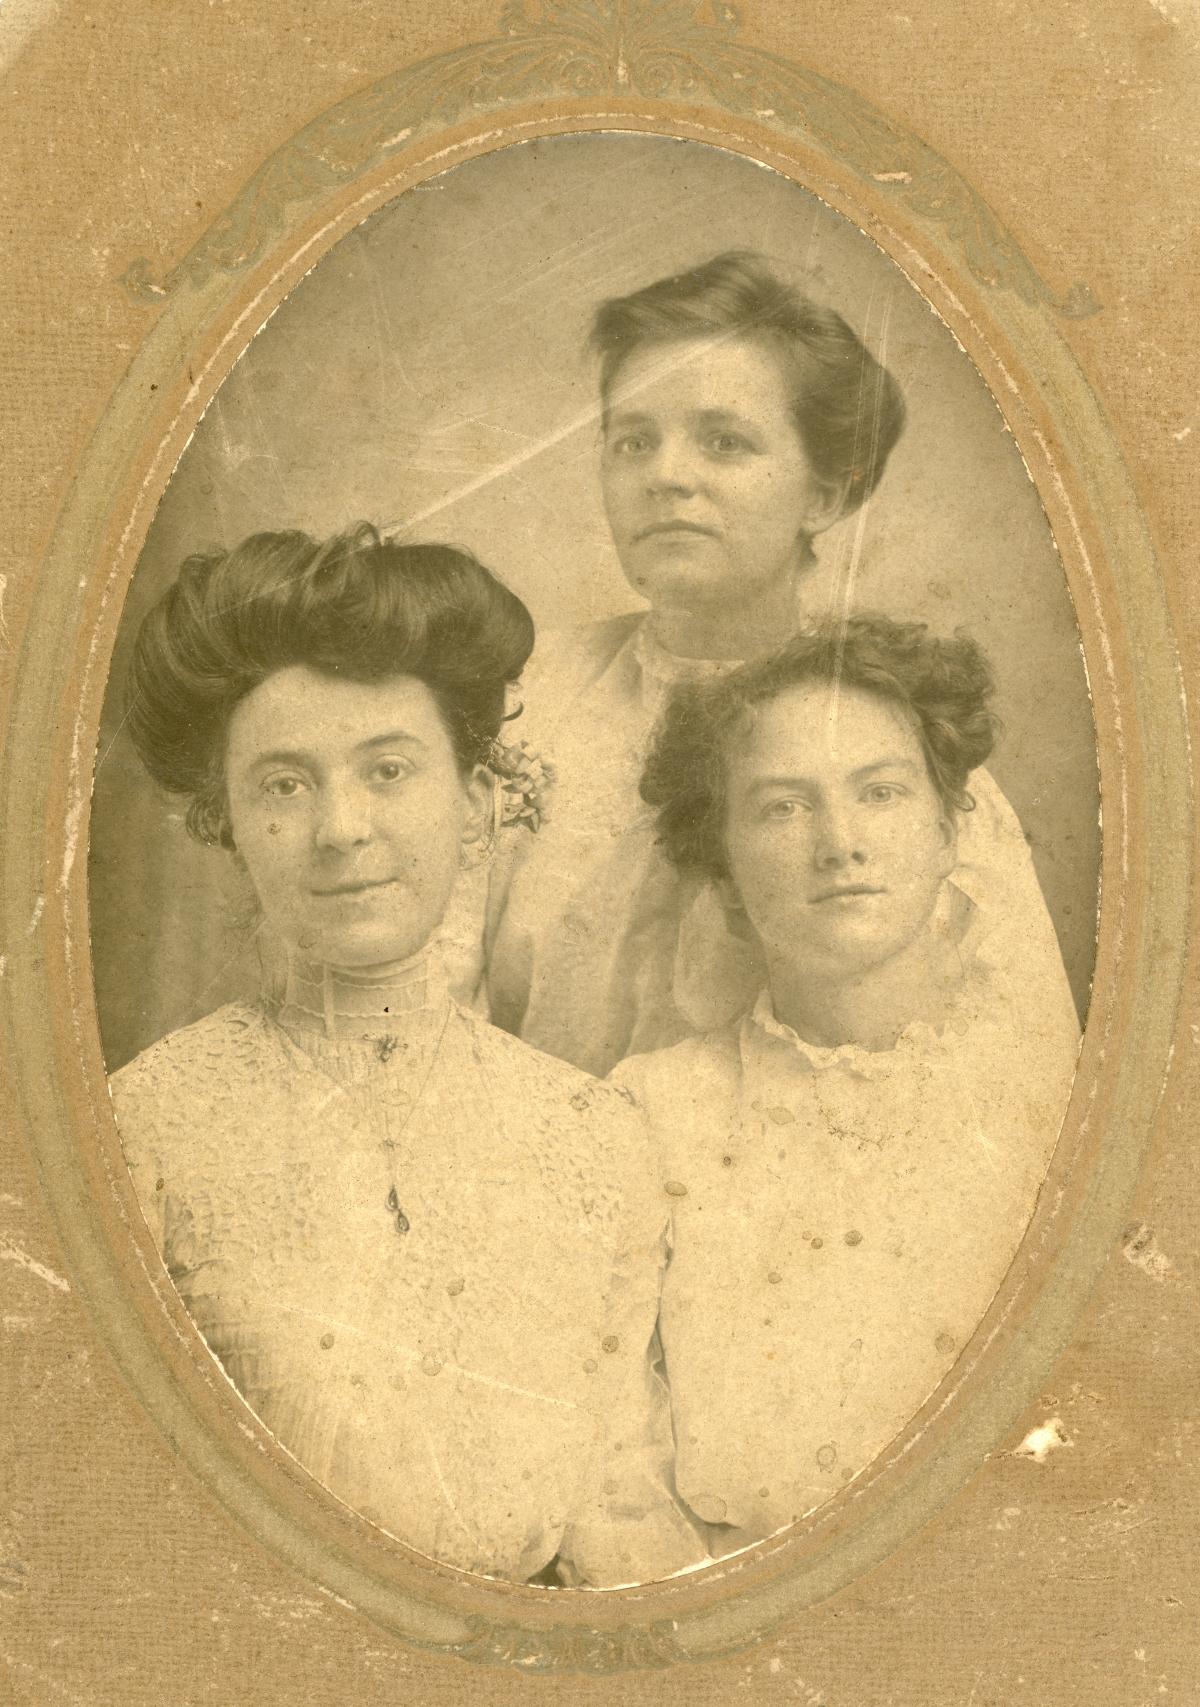 Studio portrait of three women.